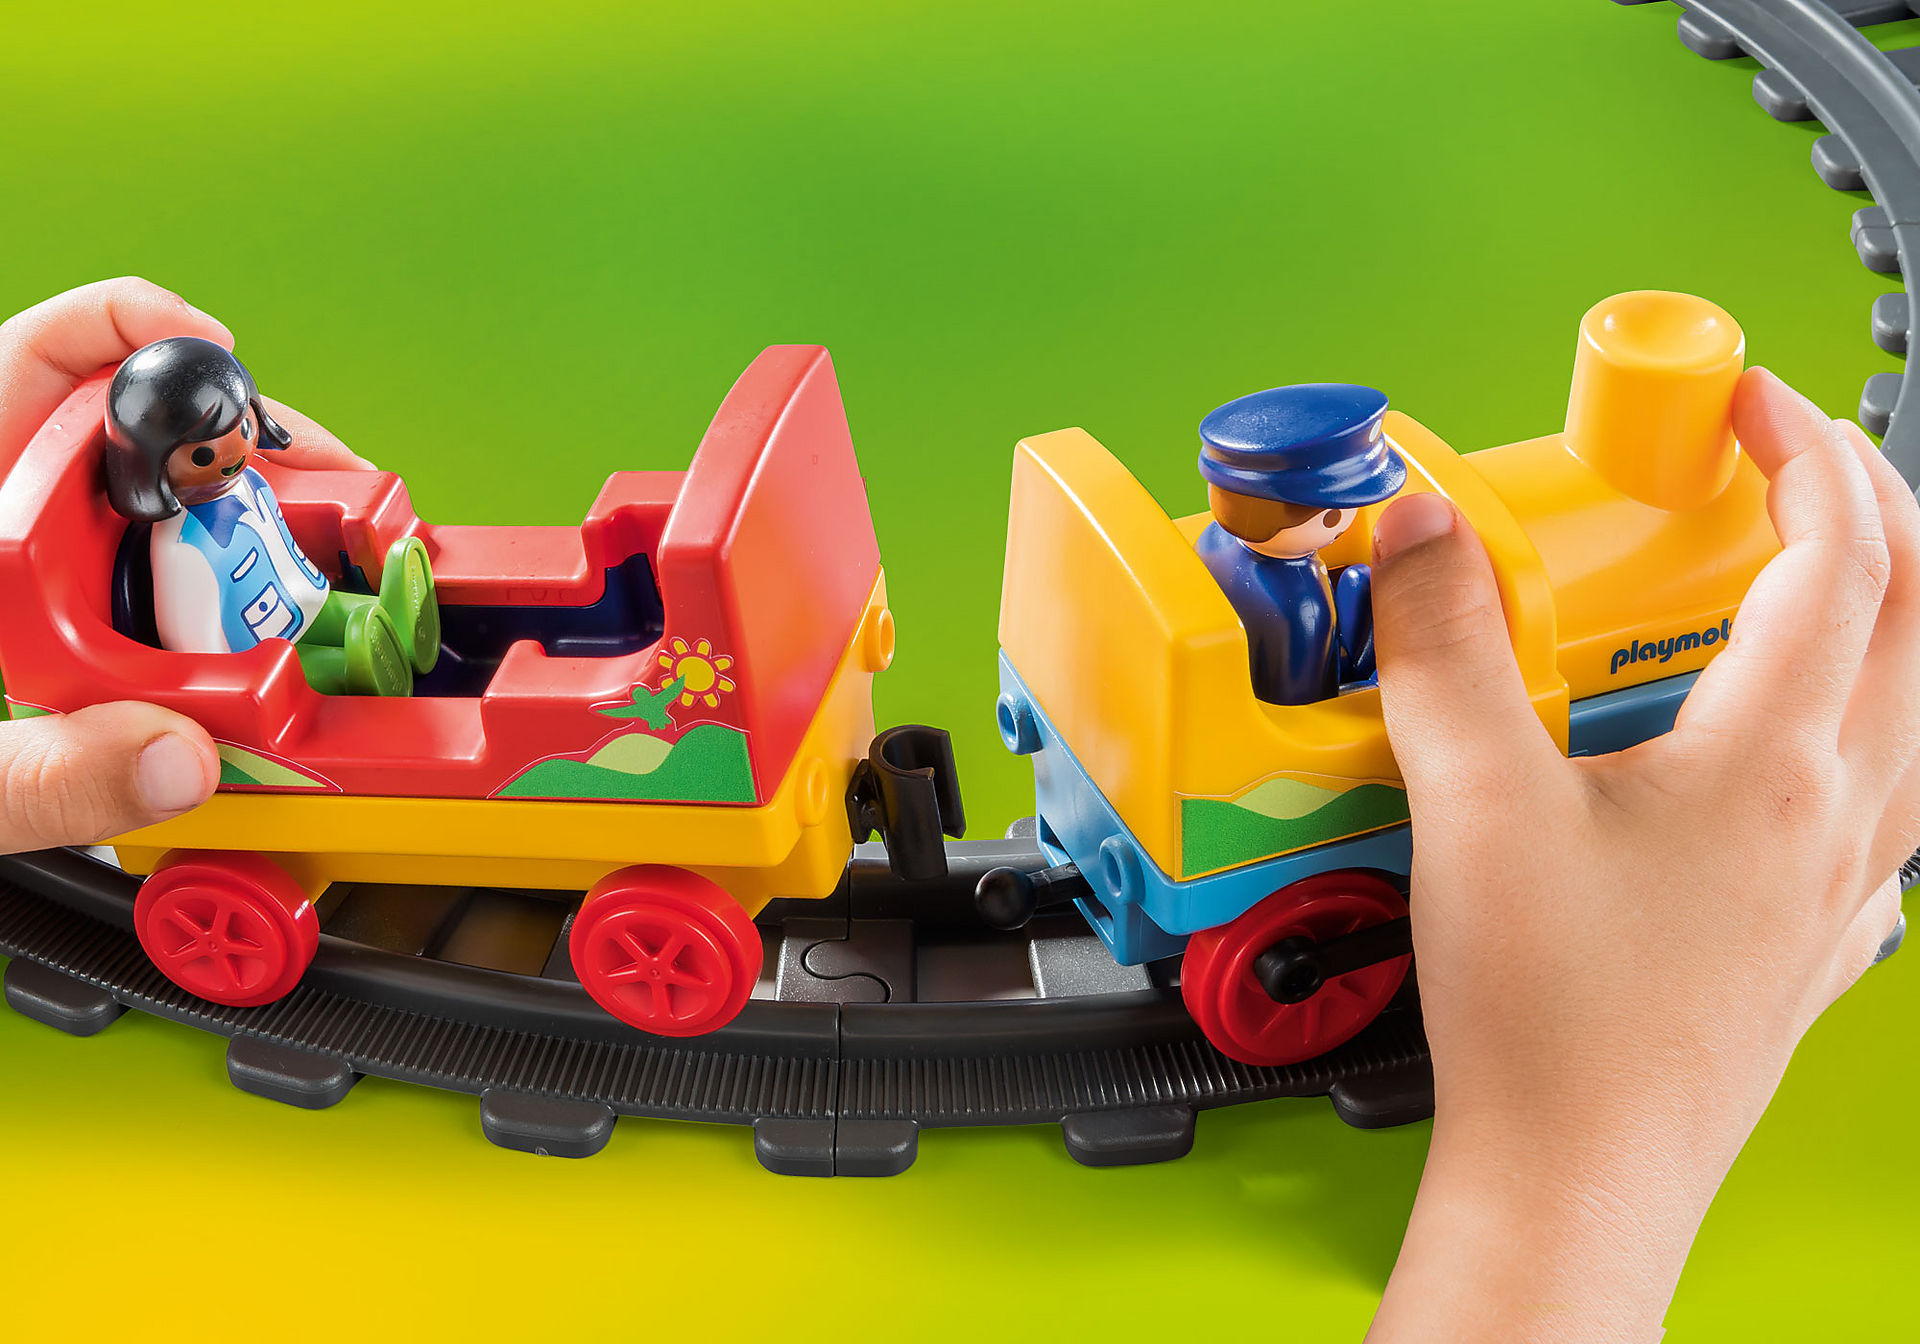 http://media.playmobil.com/i/playmobil/70179_product_extra4/My first train set